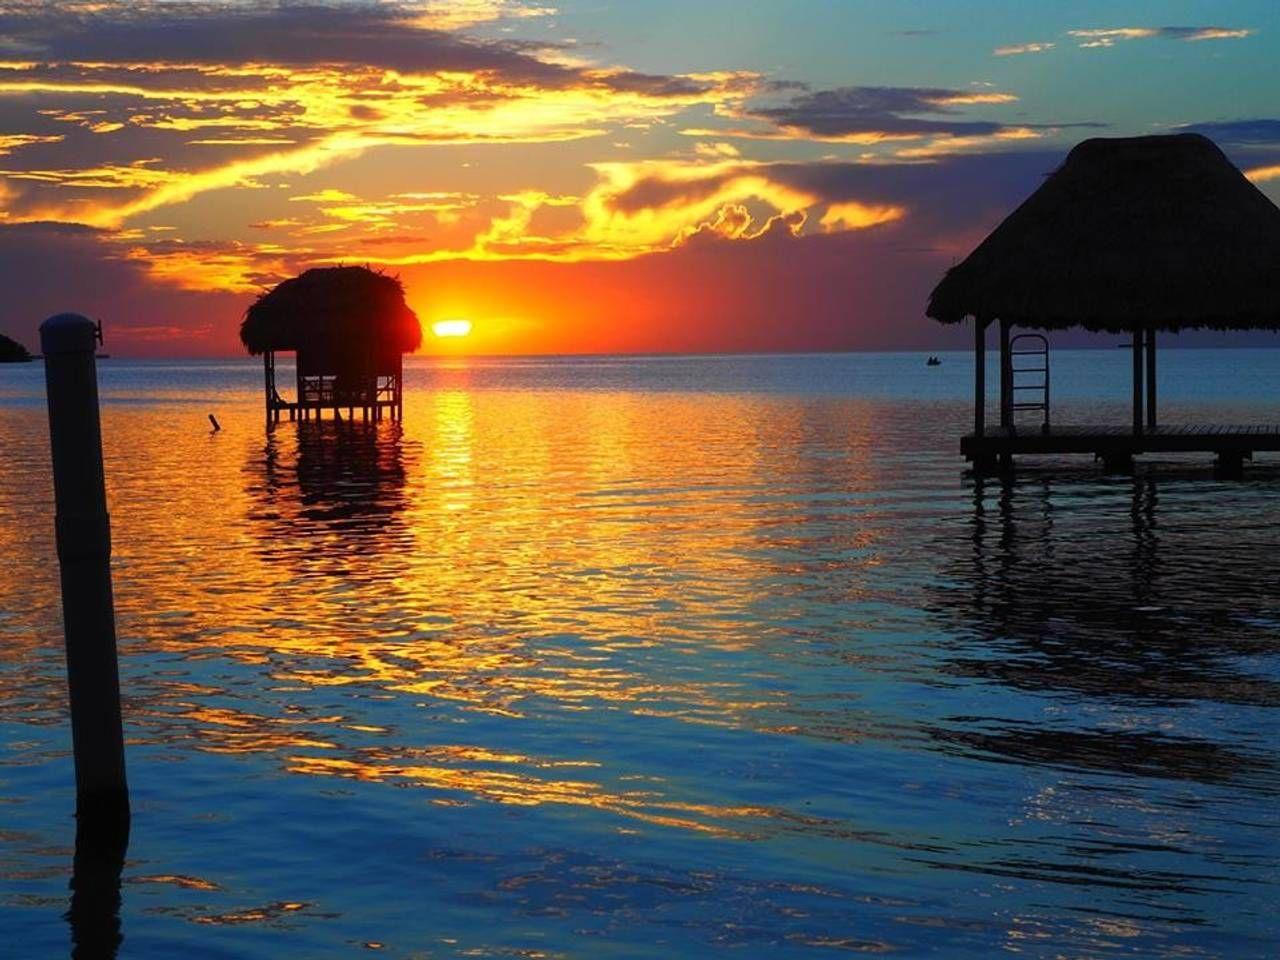 Sunset Cabana Caye Caulker Air Bnb Photo By Andy Horton